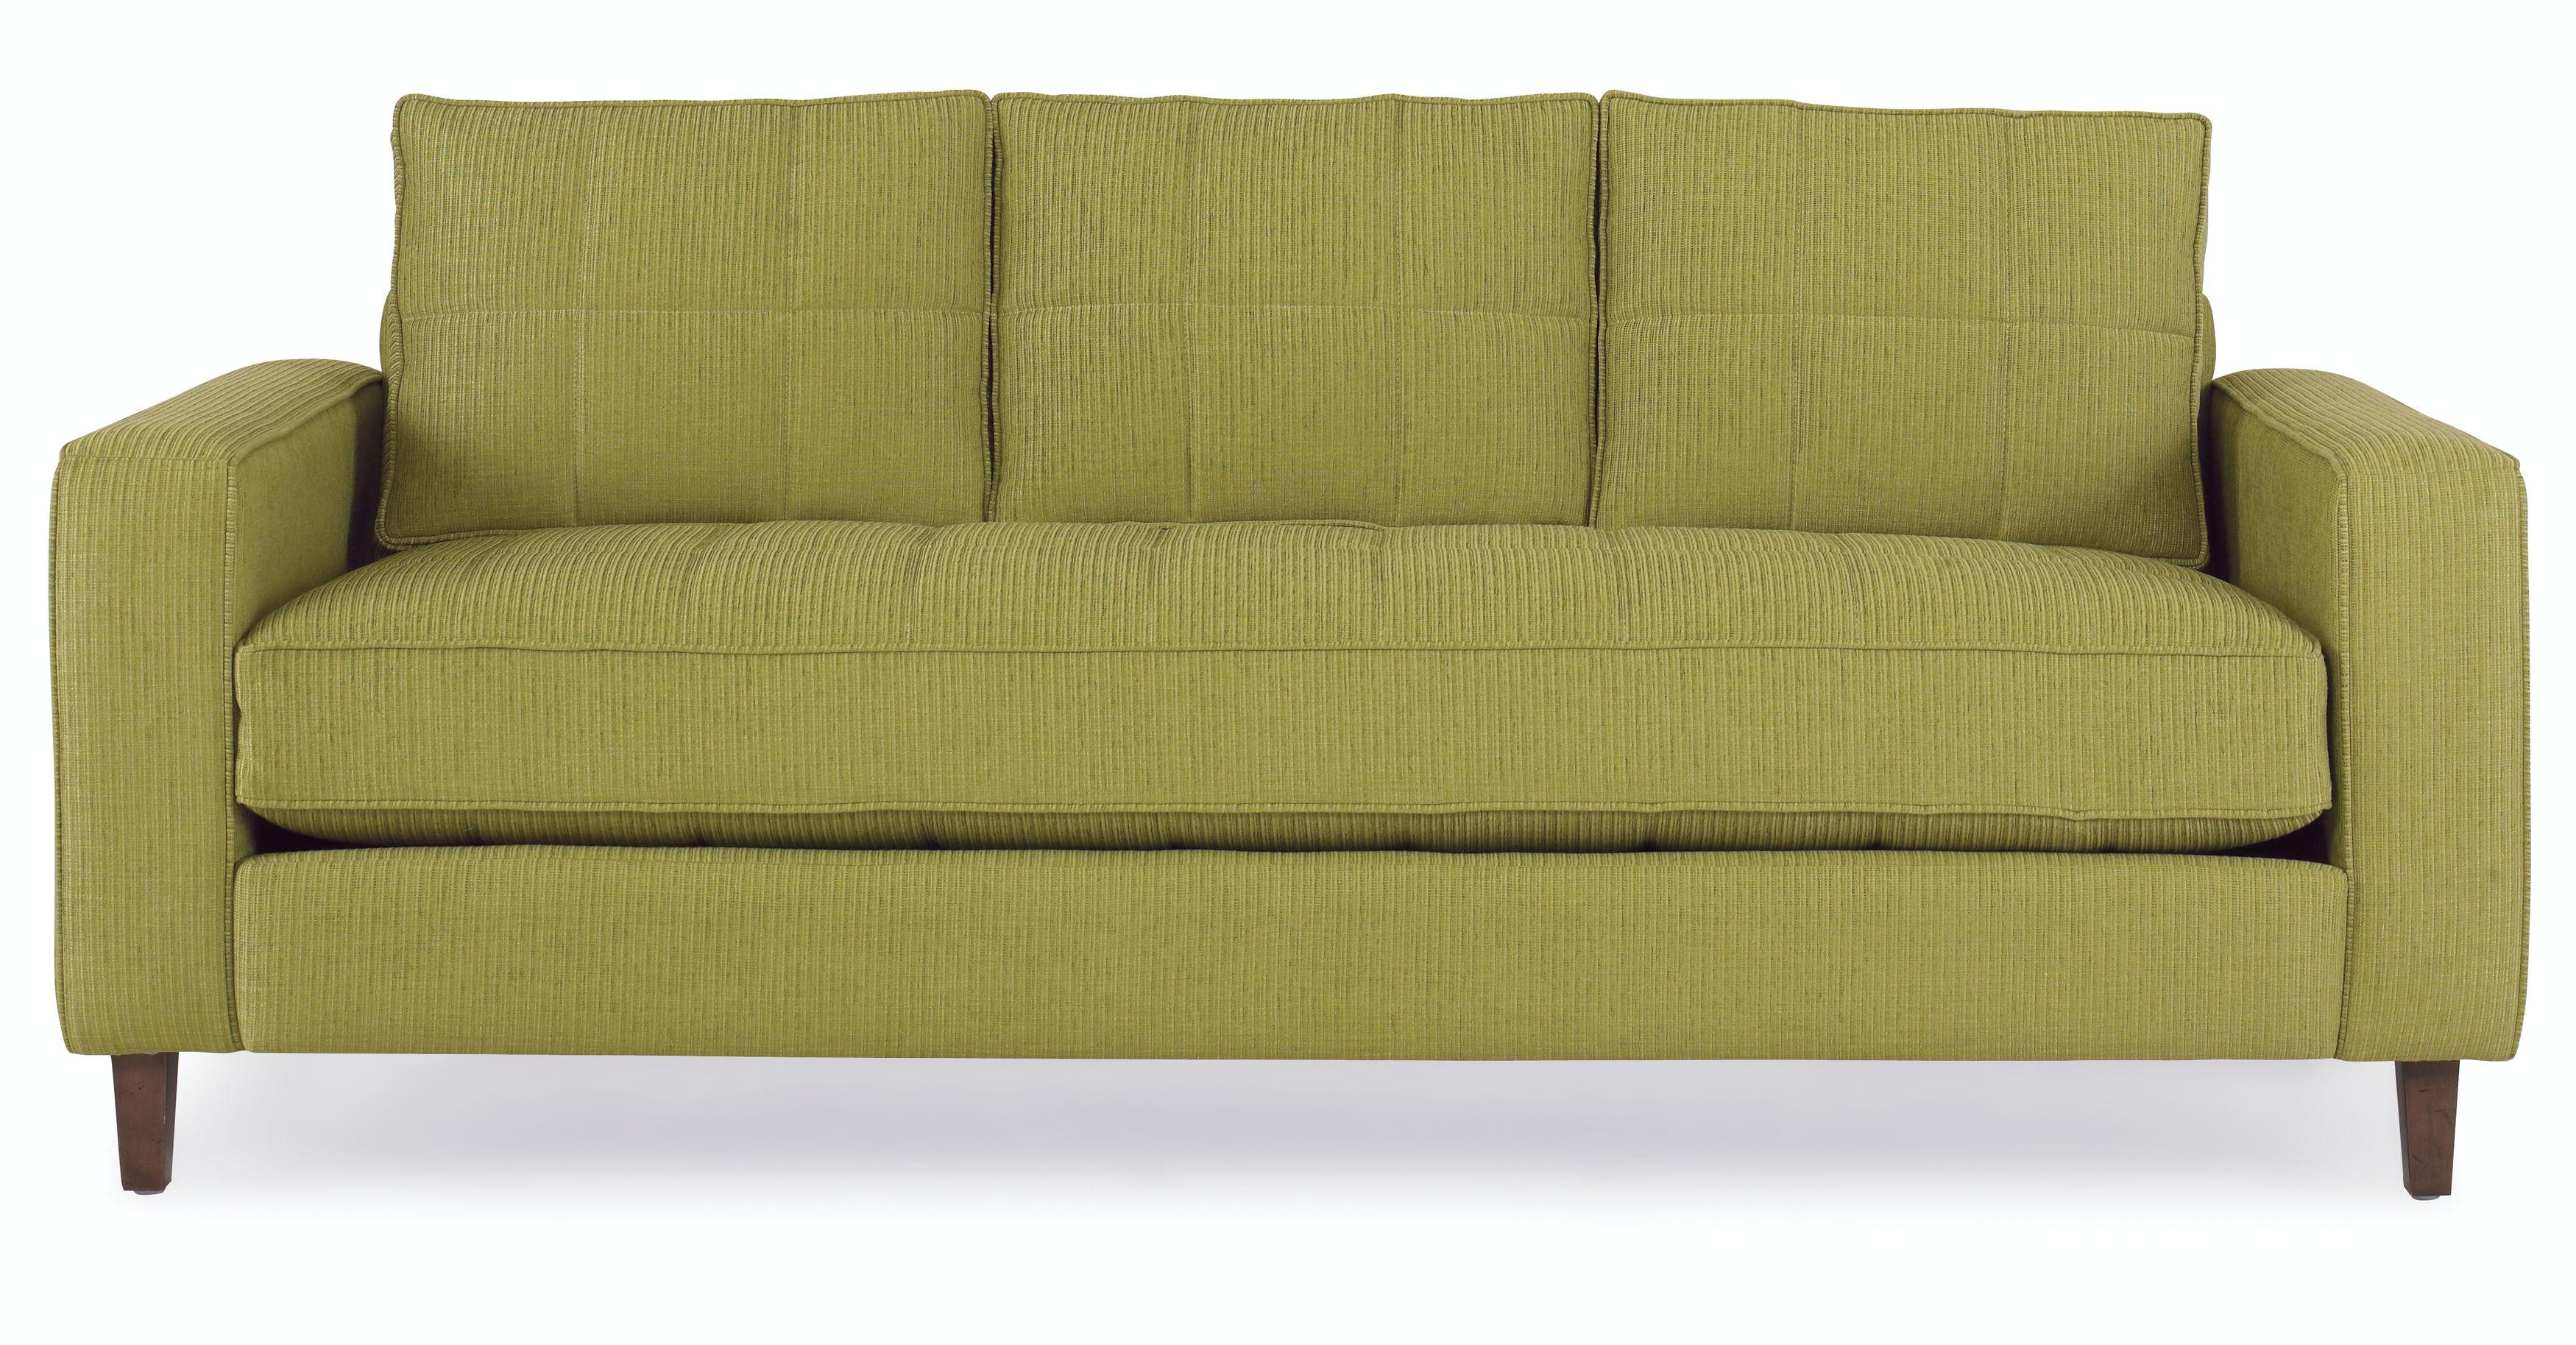 Kravet Smart Kent Sofa DL901 1